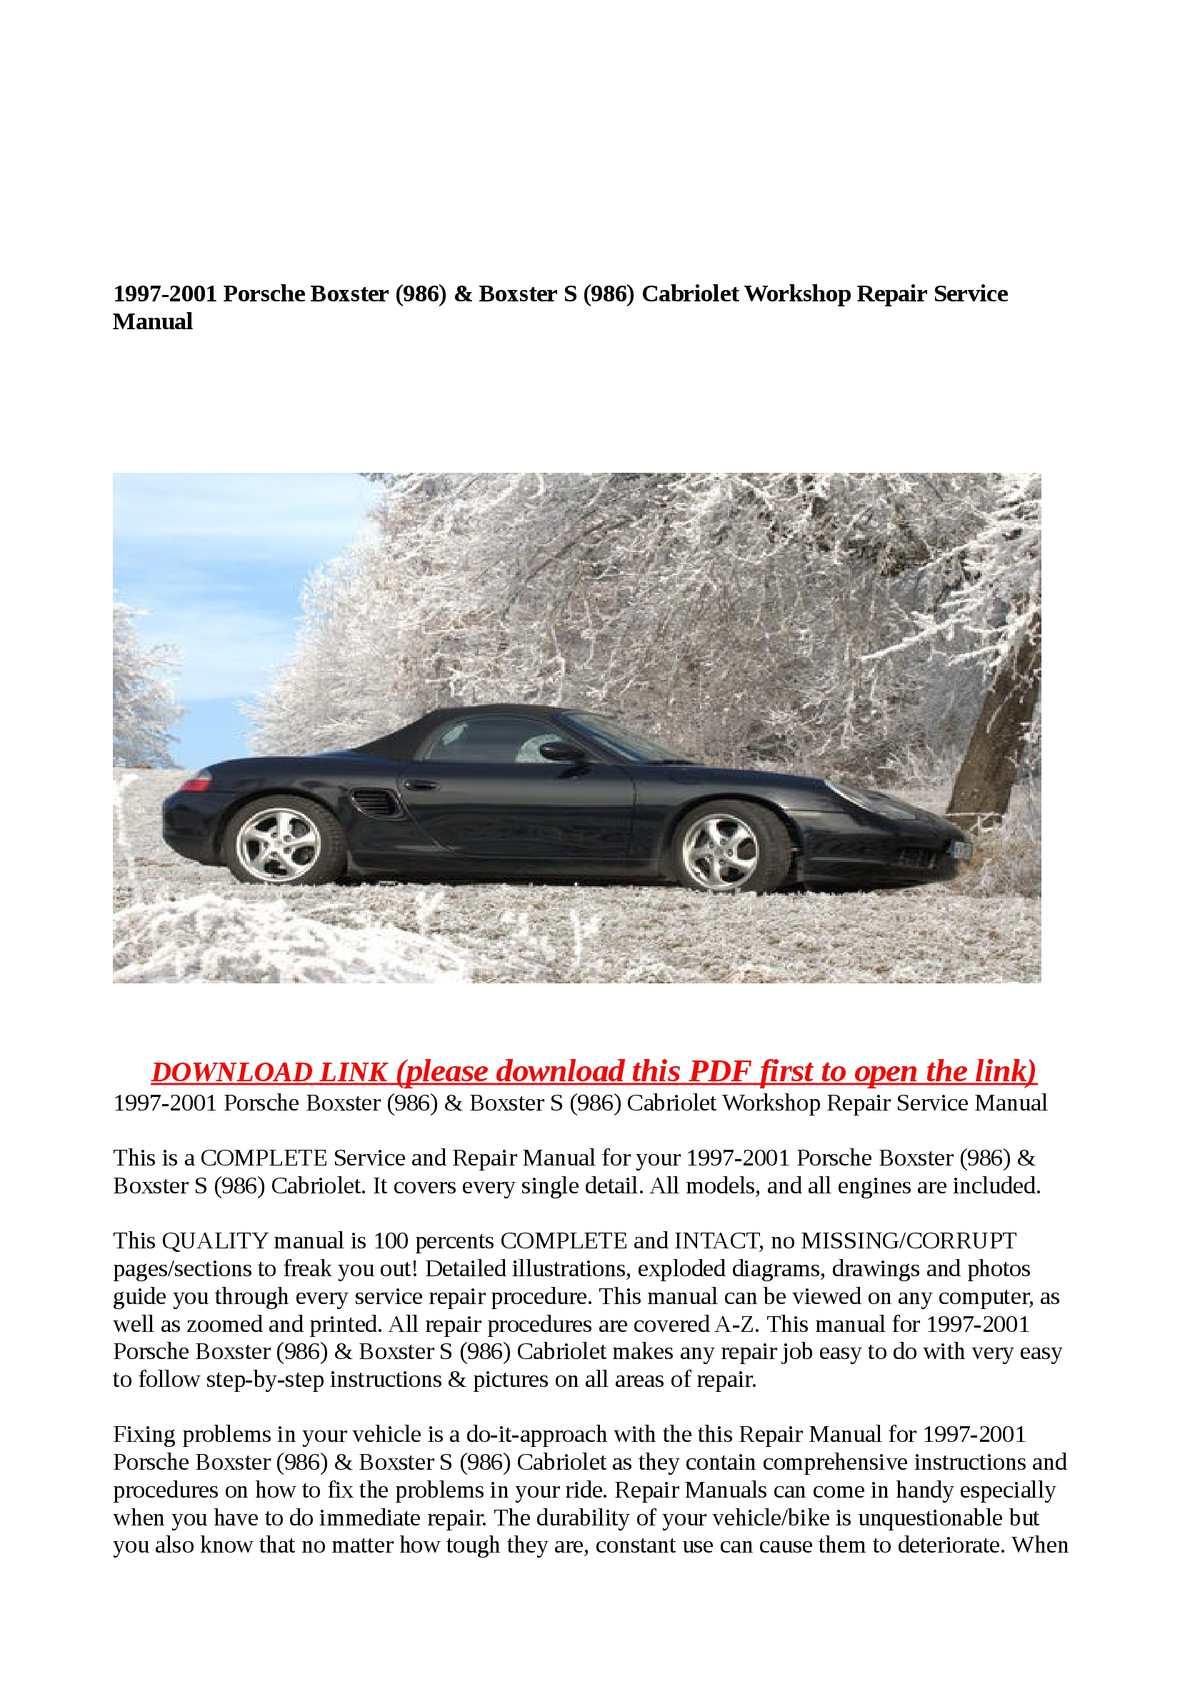 Calaméo - 1997-2001 Porsche Boxster (986) & Boxster S (986) Cabriolet  Workshop Repair Service Manual